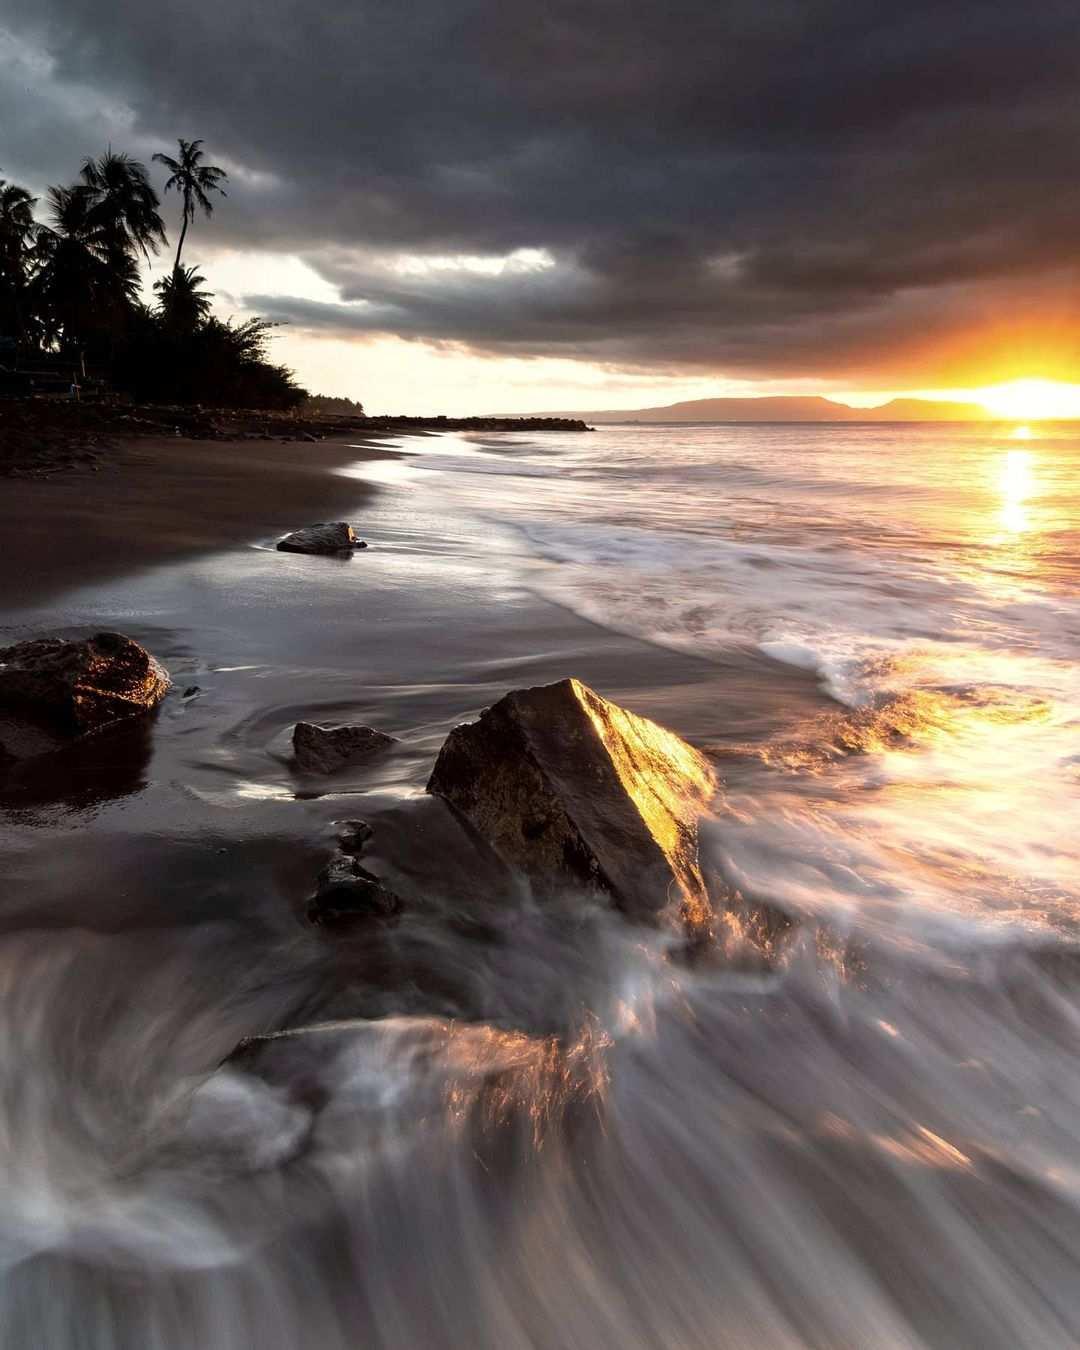 Keindahan Sunset di Pantai Cacalan Image From @hendhyhiemawan